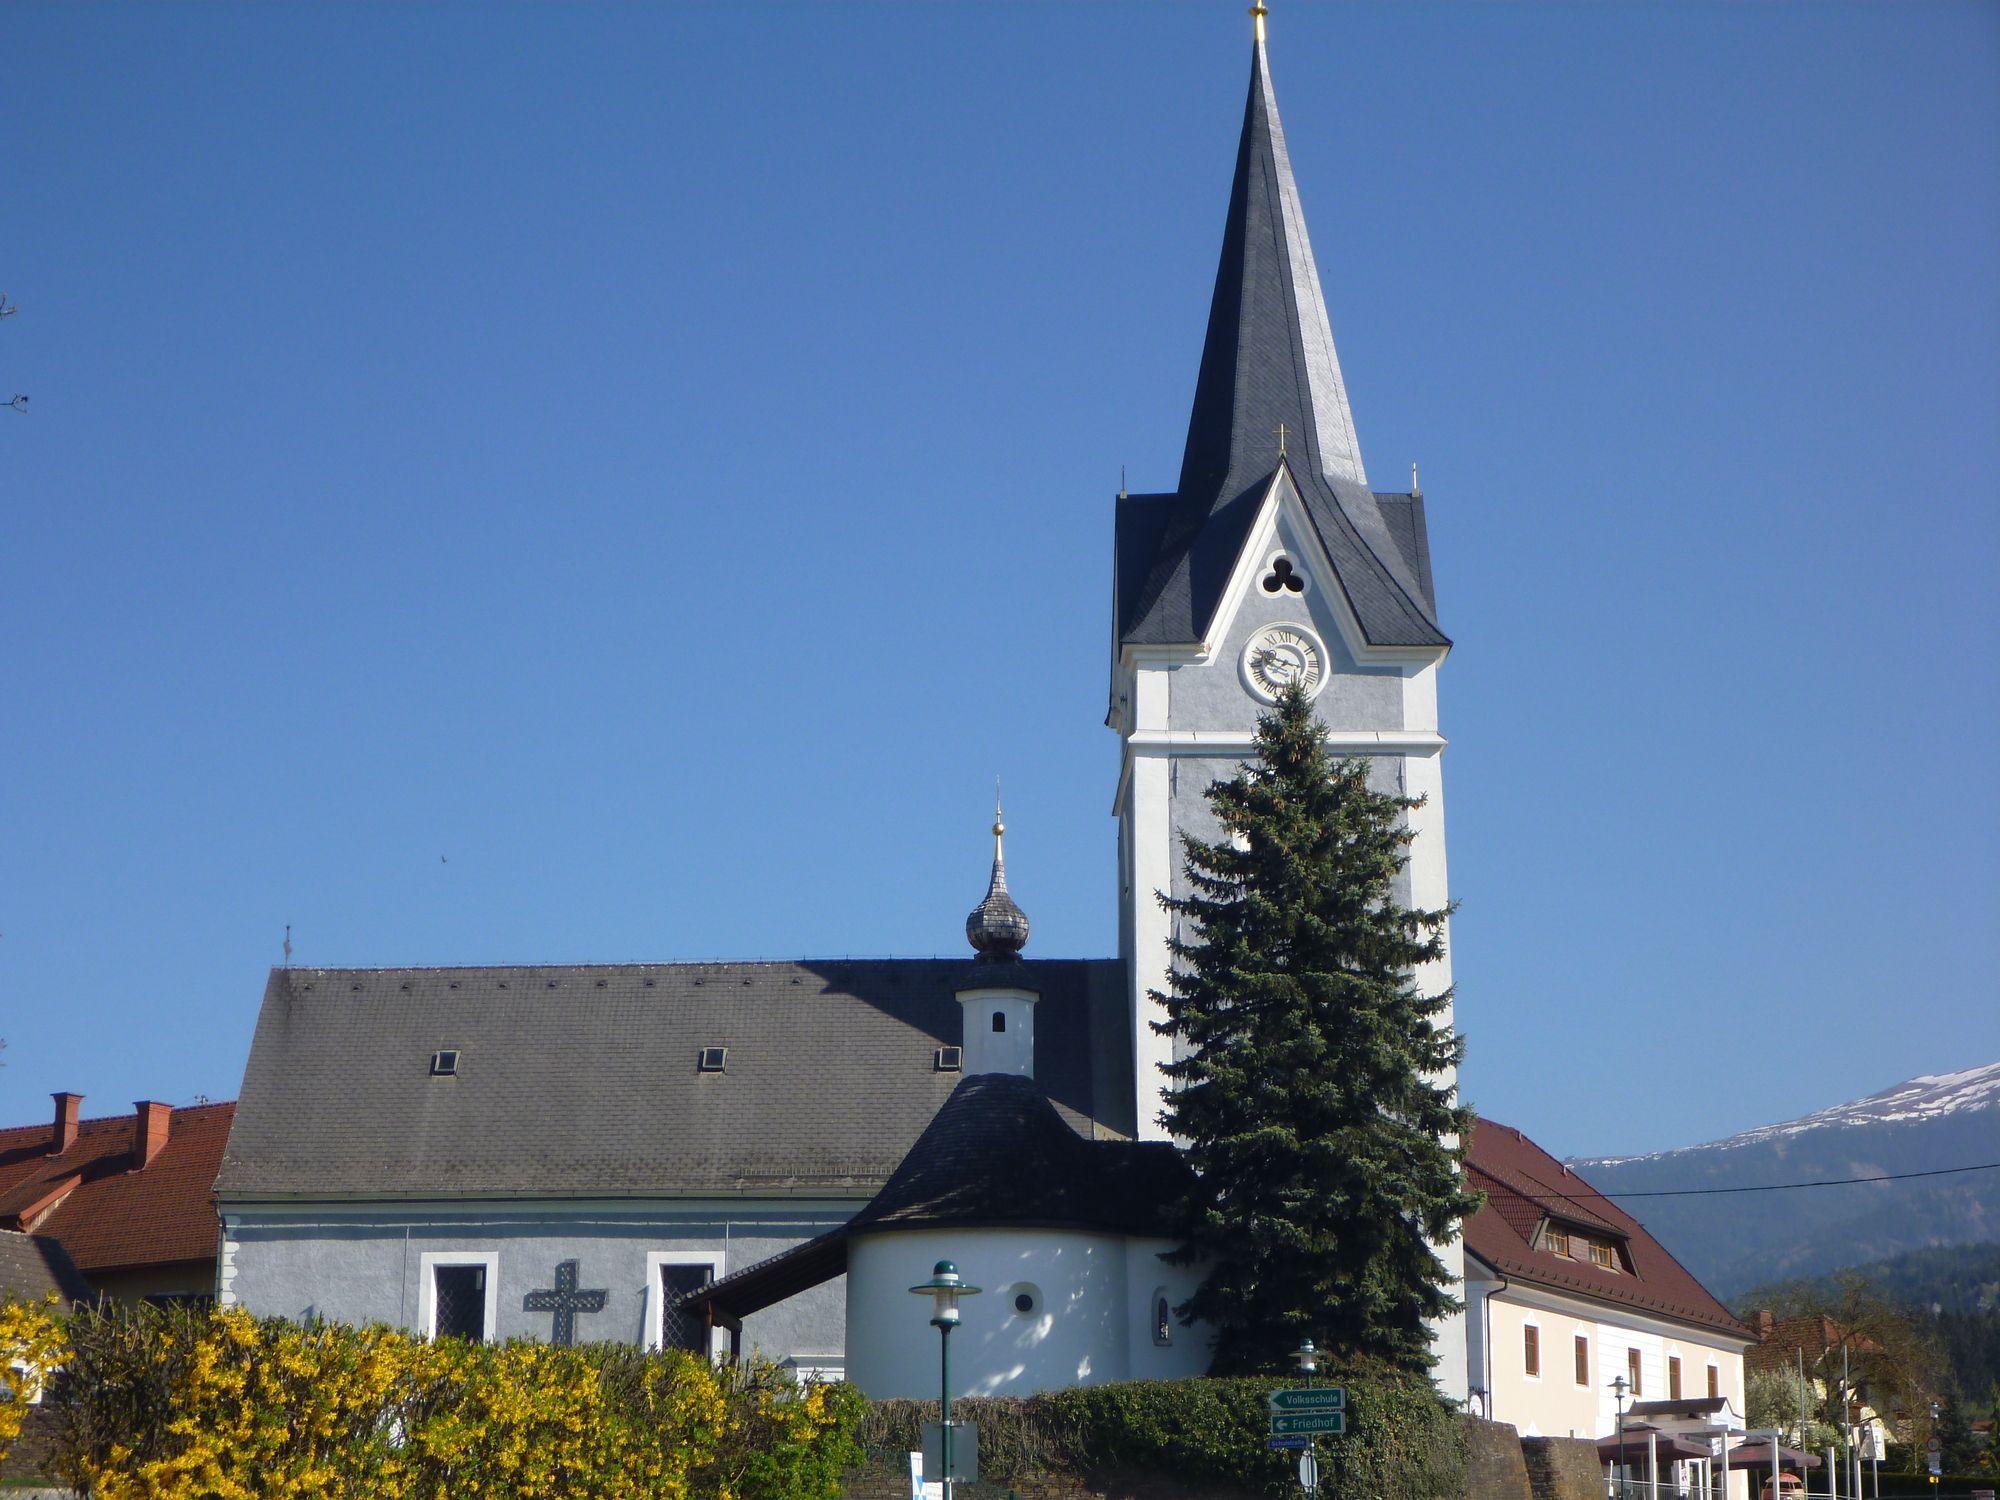 Dezember 2011 - St. Georgen im Lavanttal